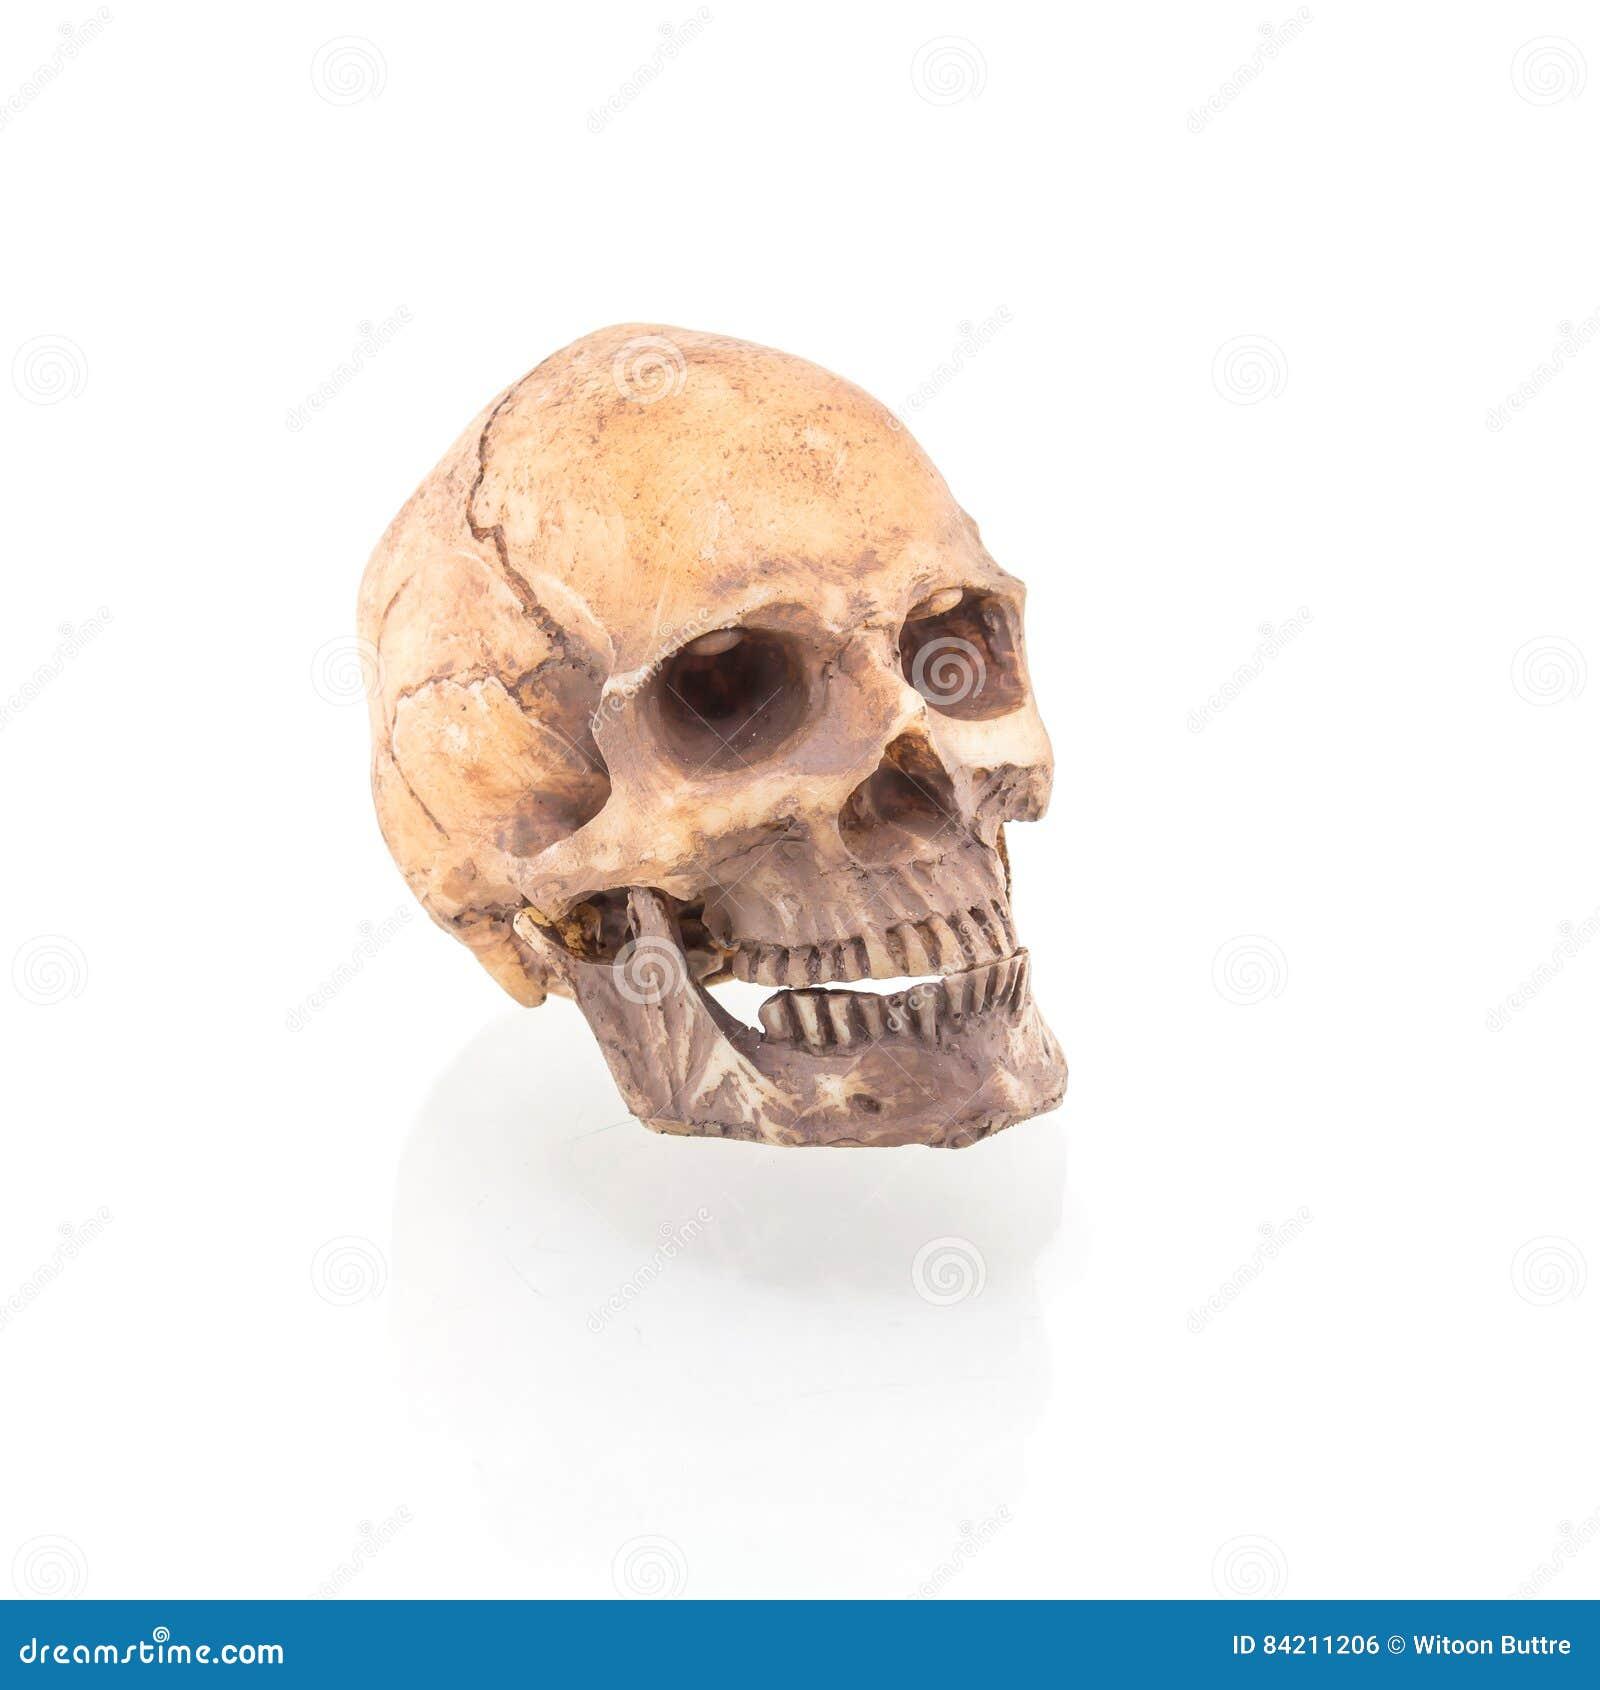 Human skull on isolated